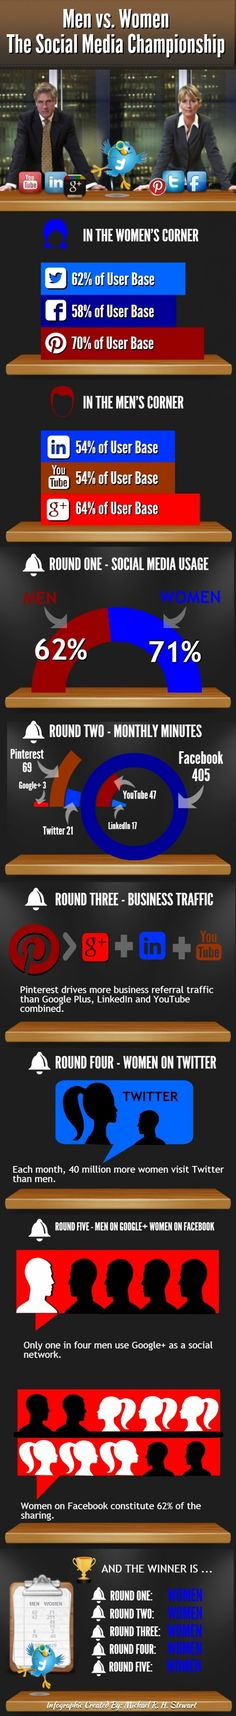 Men vs. Women – The Social Media Championship Infographic